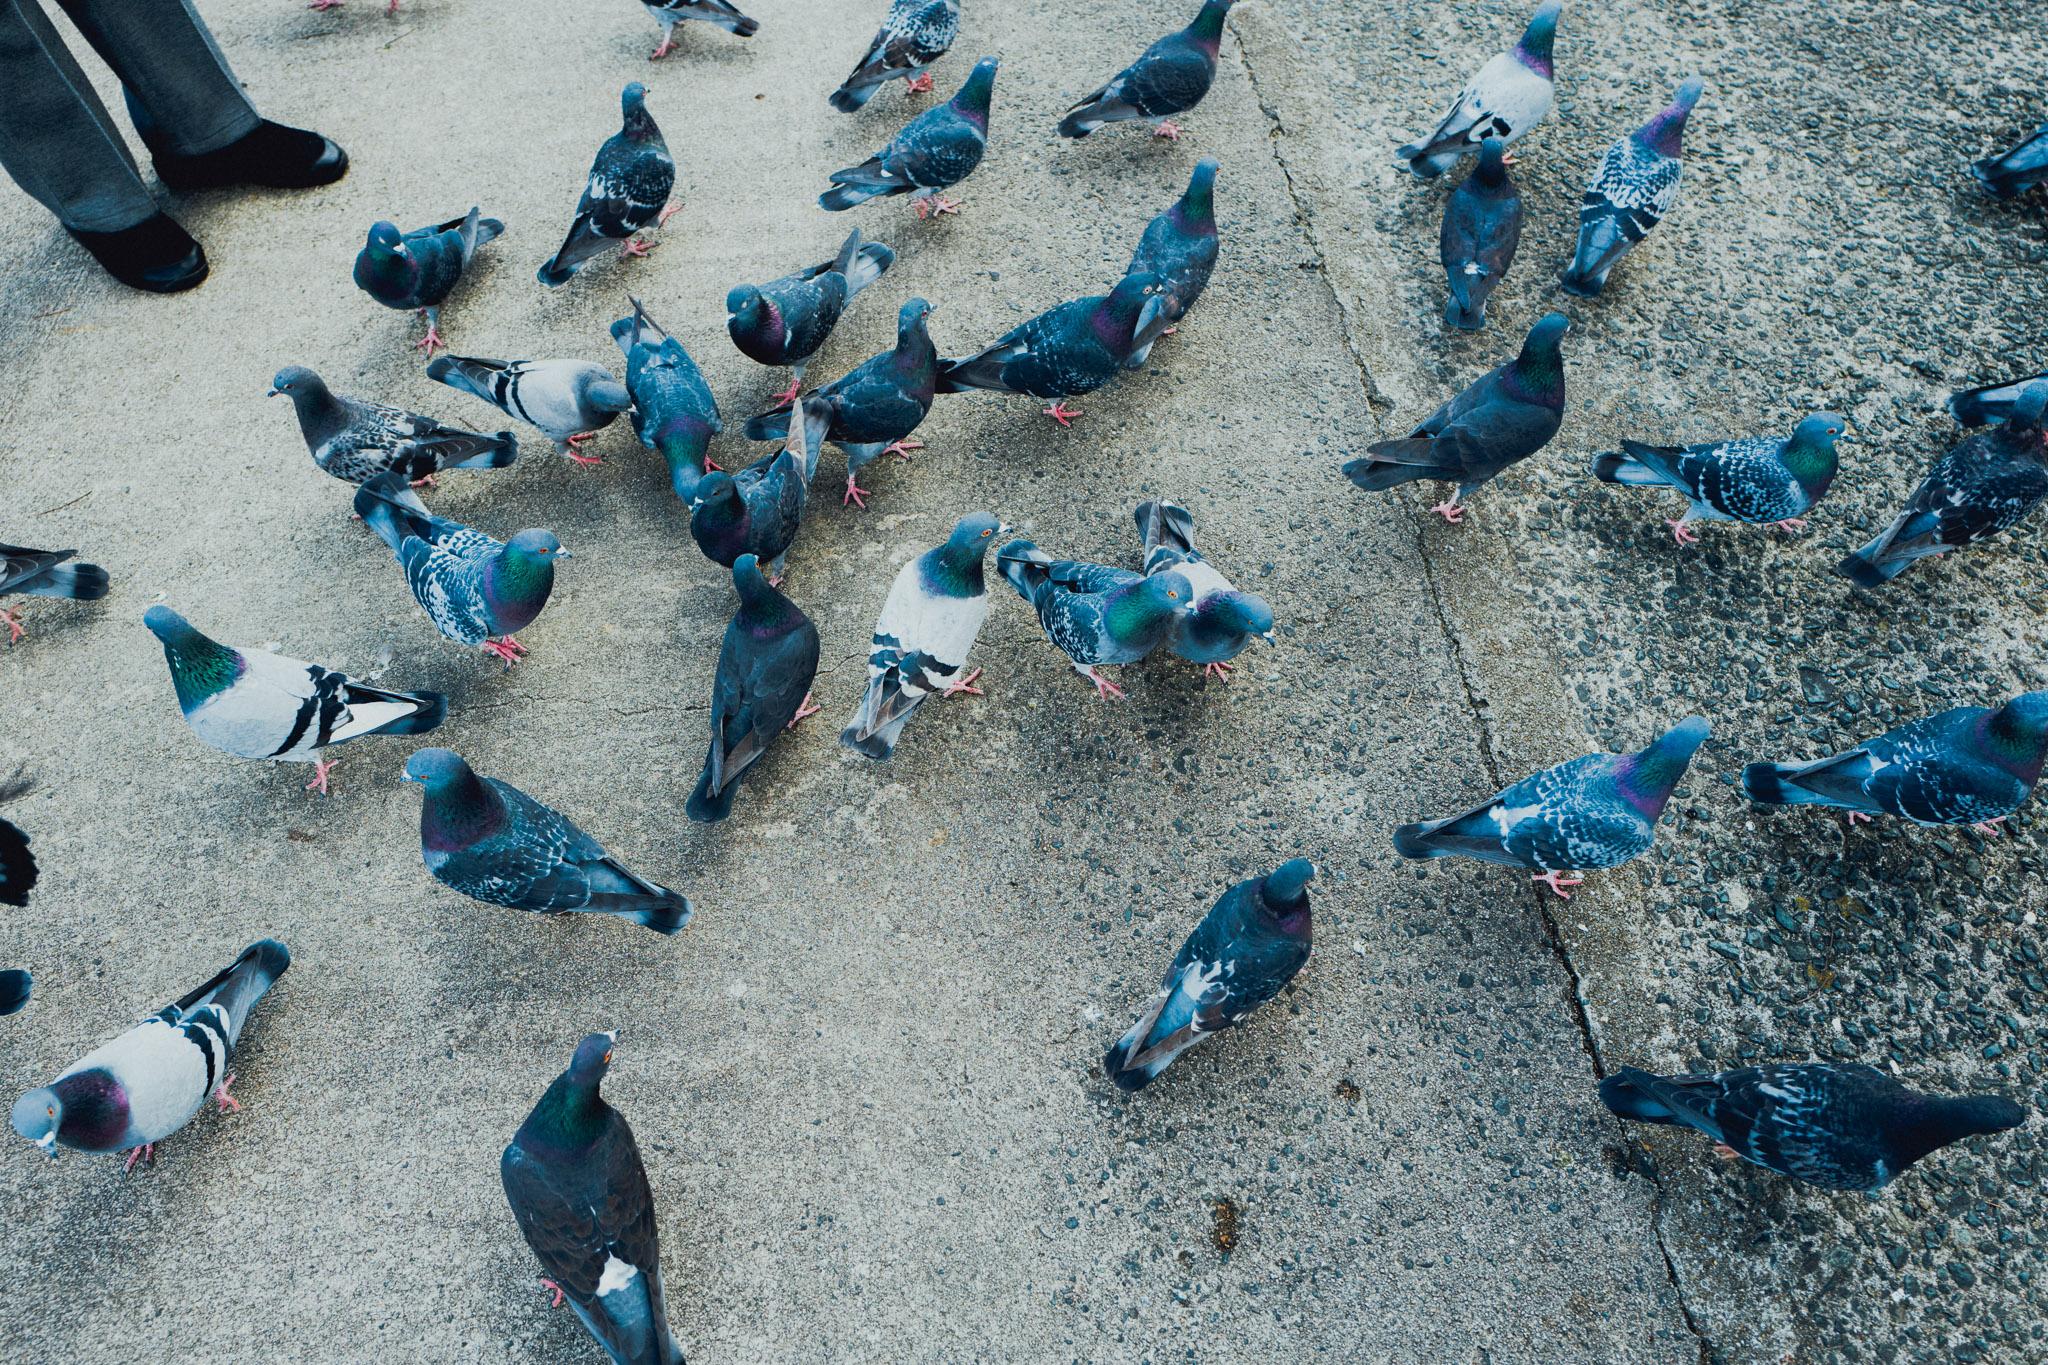 leica-q-photographer-birds-fukuoka